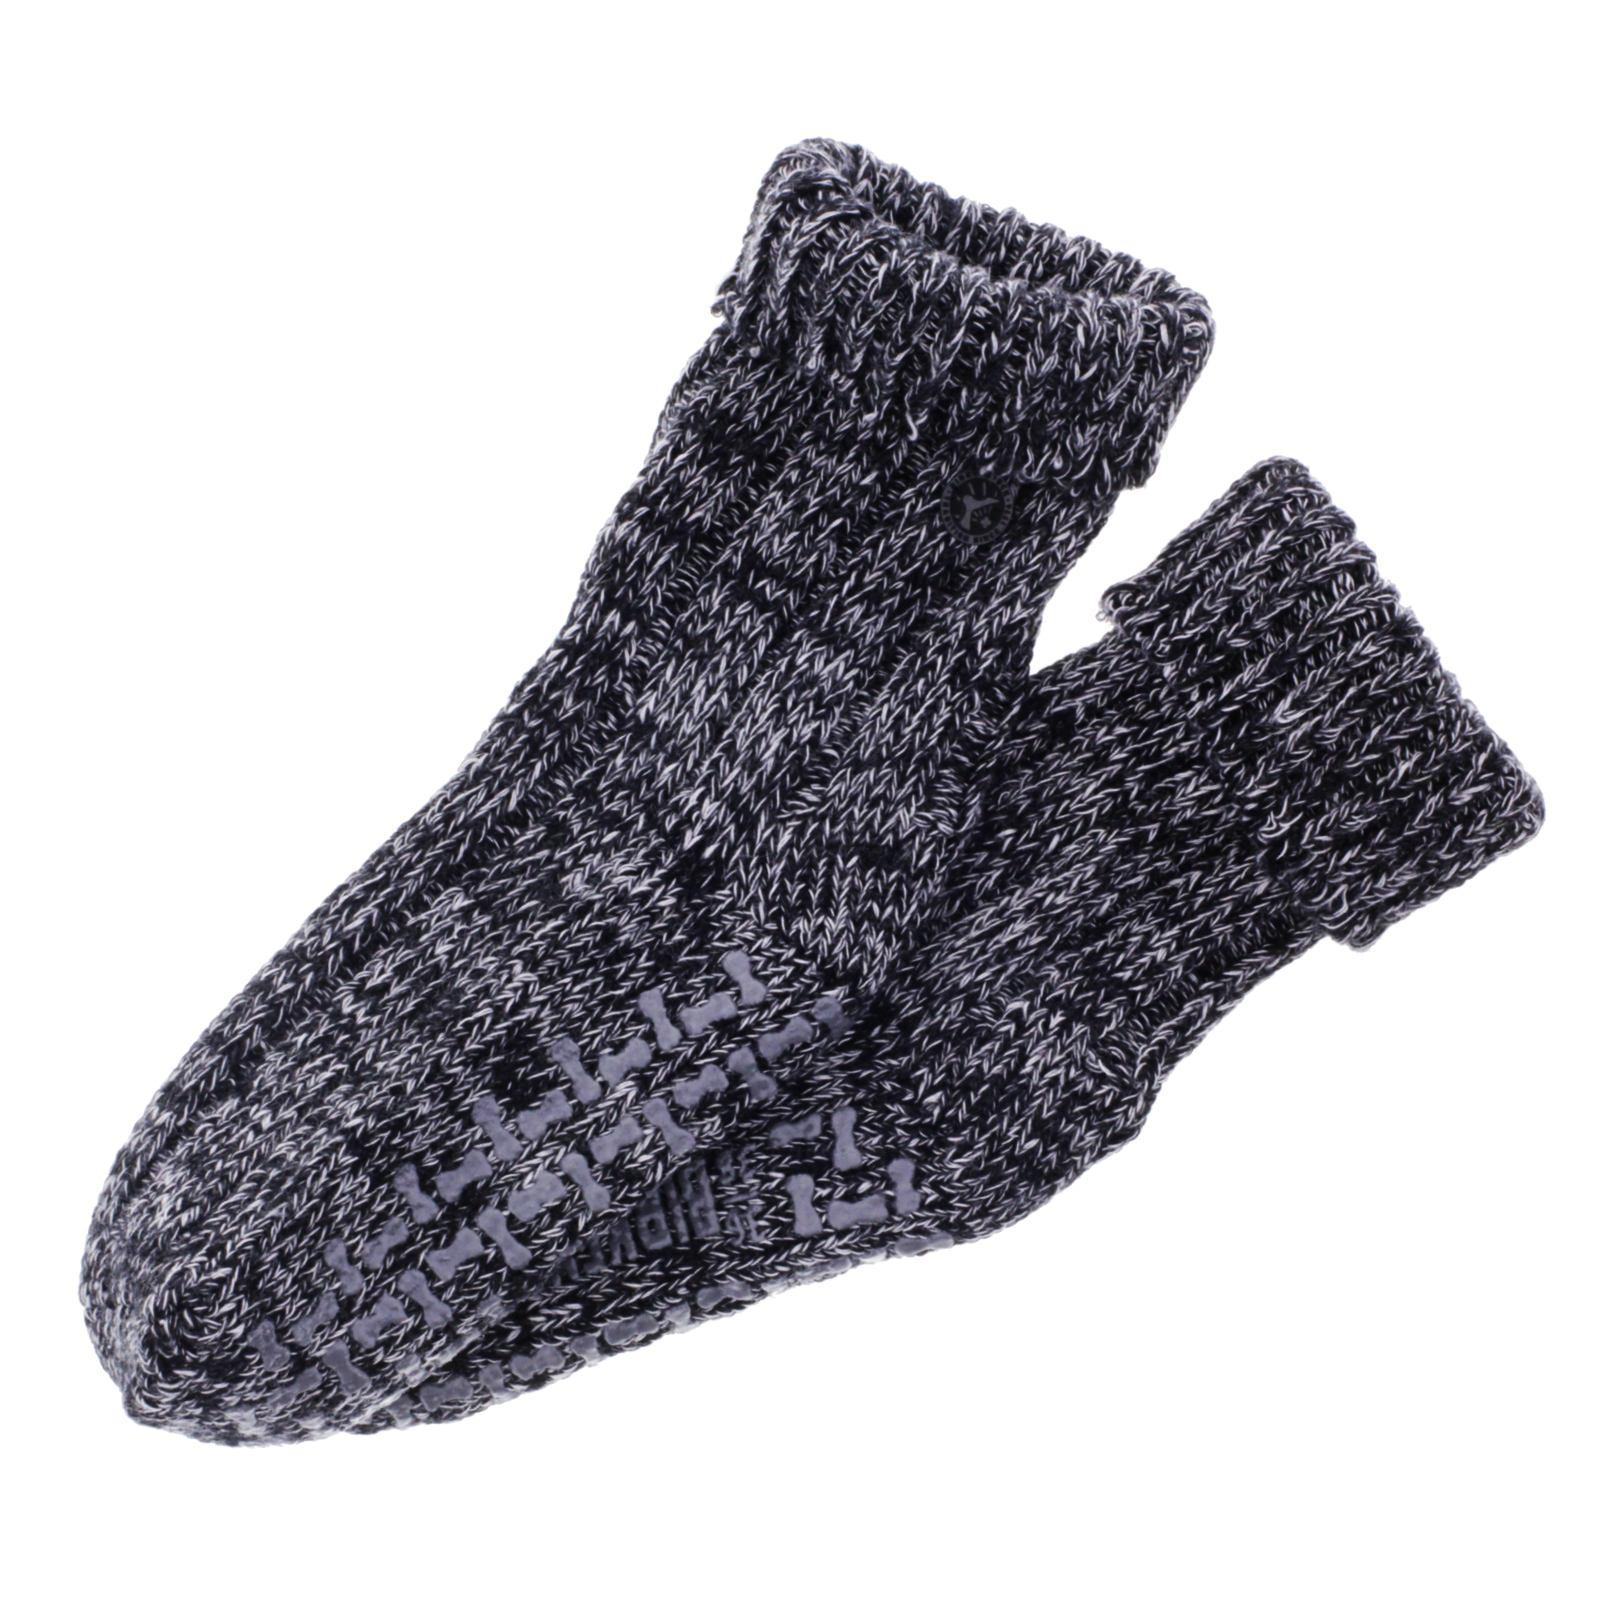 Birkenstock Damen Stopper Socken Twist HSH Anthracite